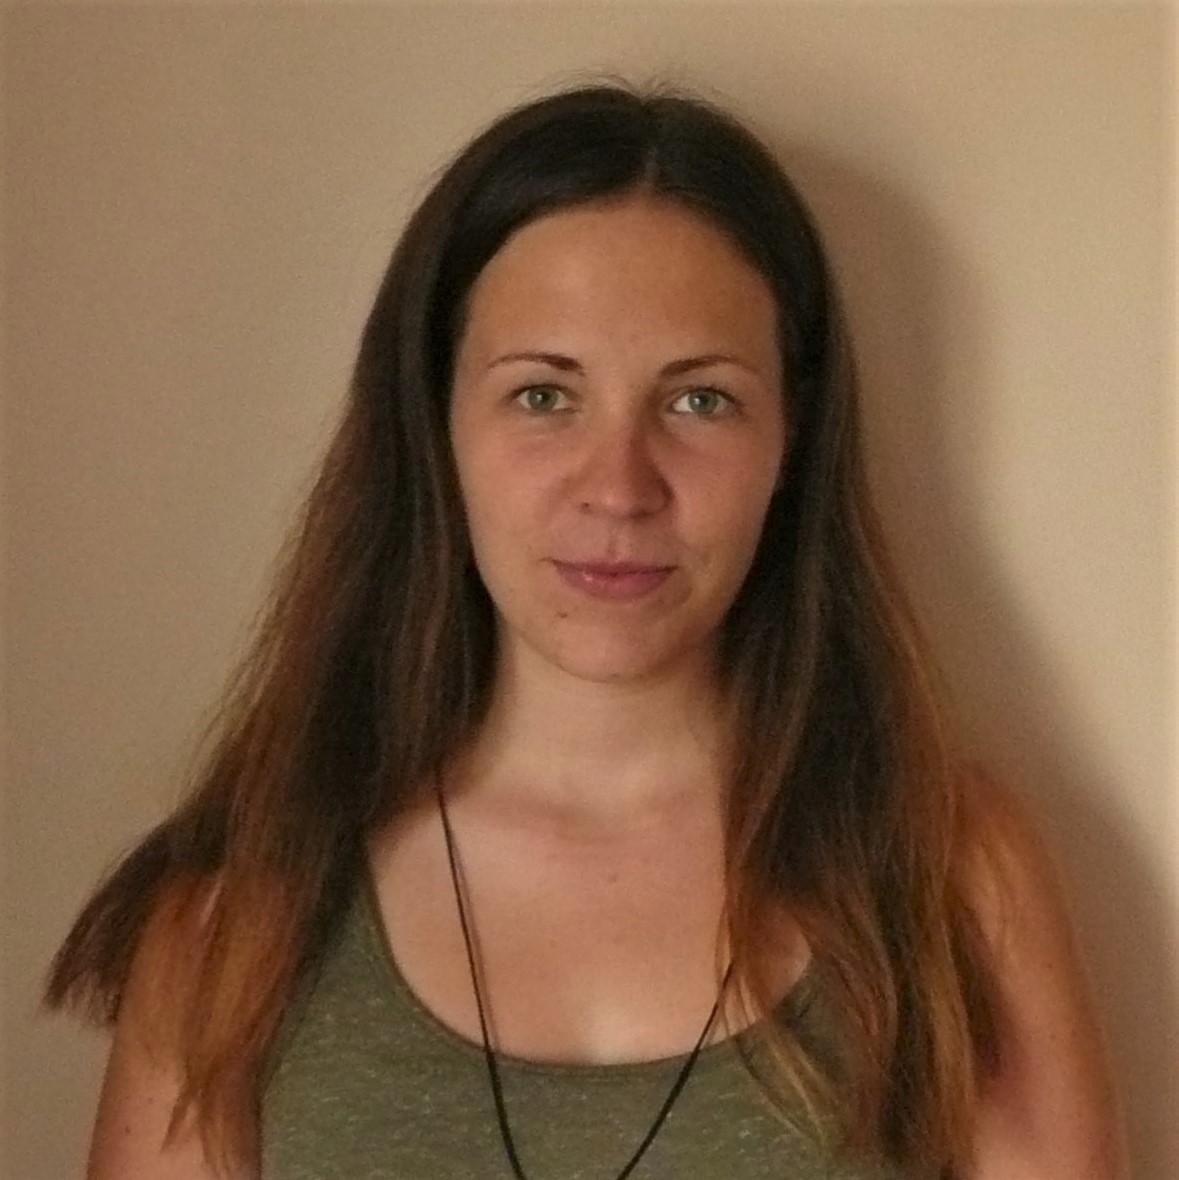 Judit Sonkoly